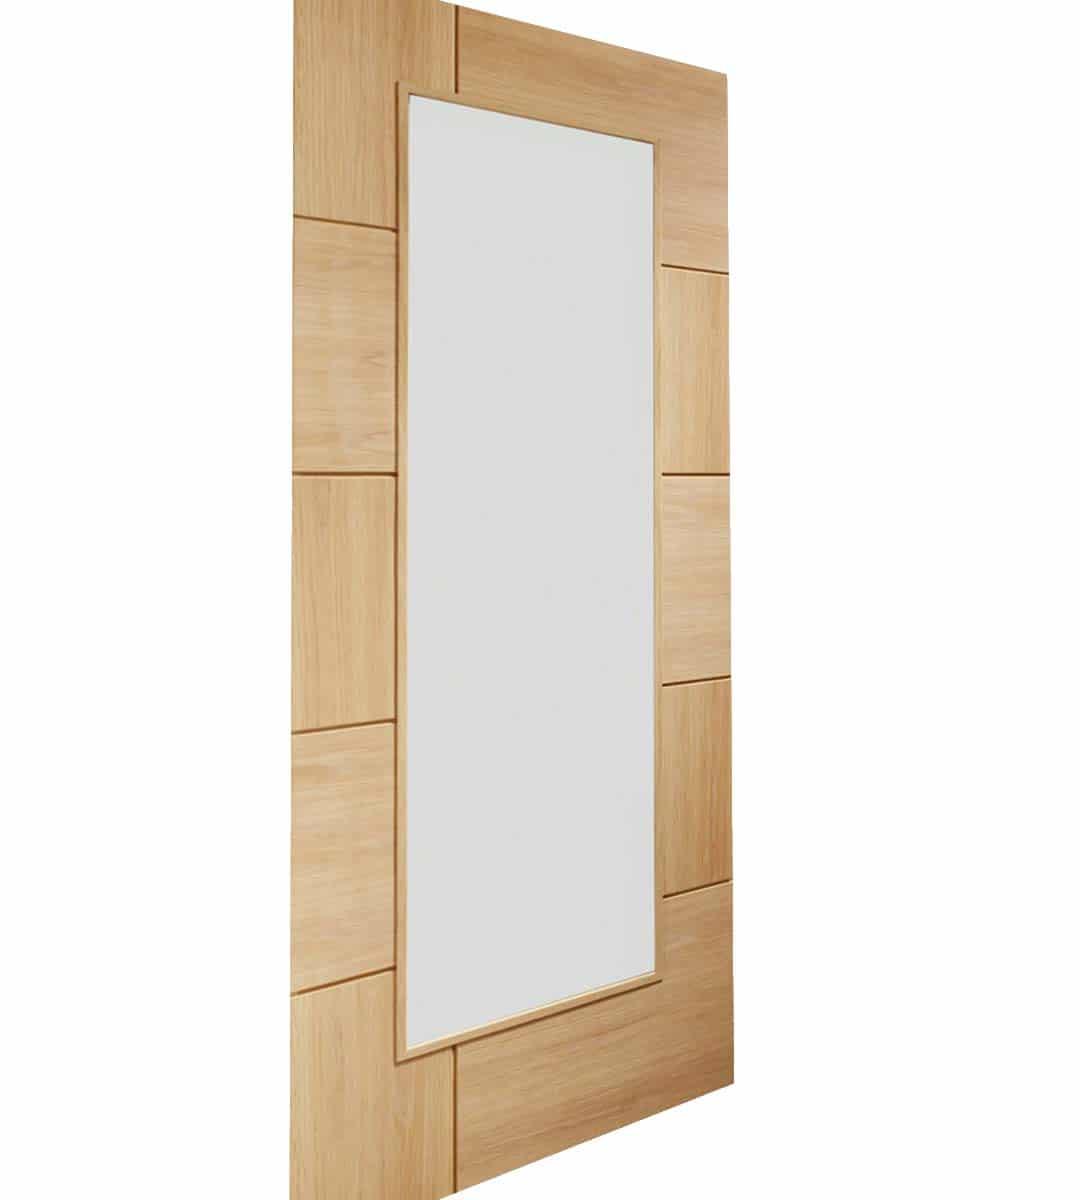 Ravenna glazed interior door